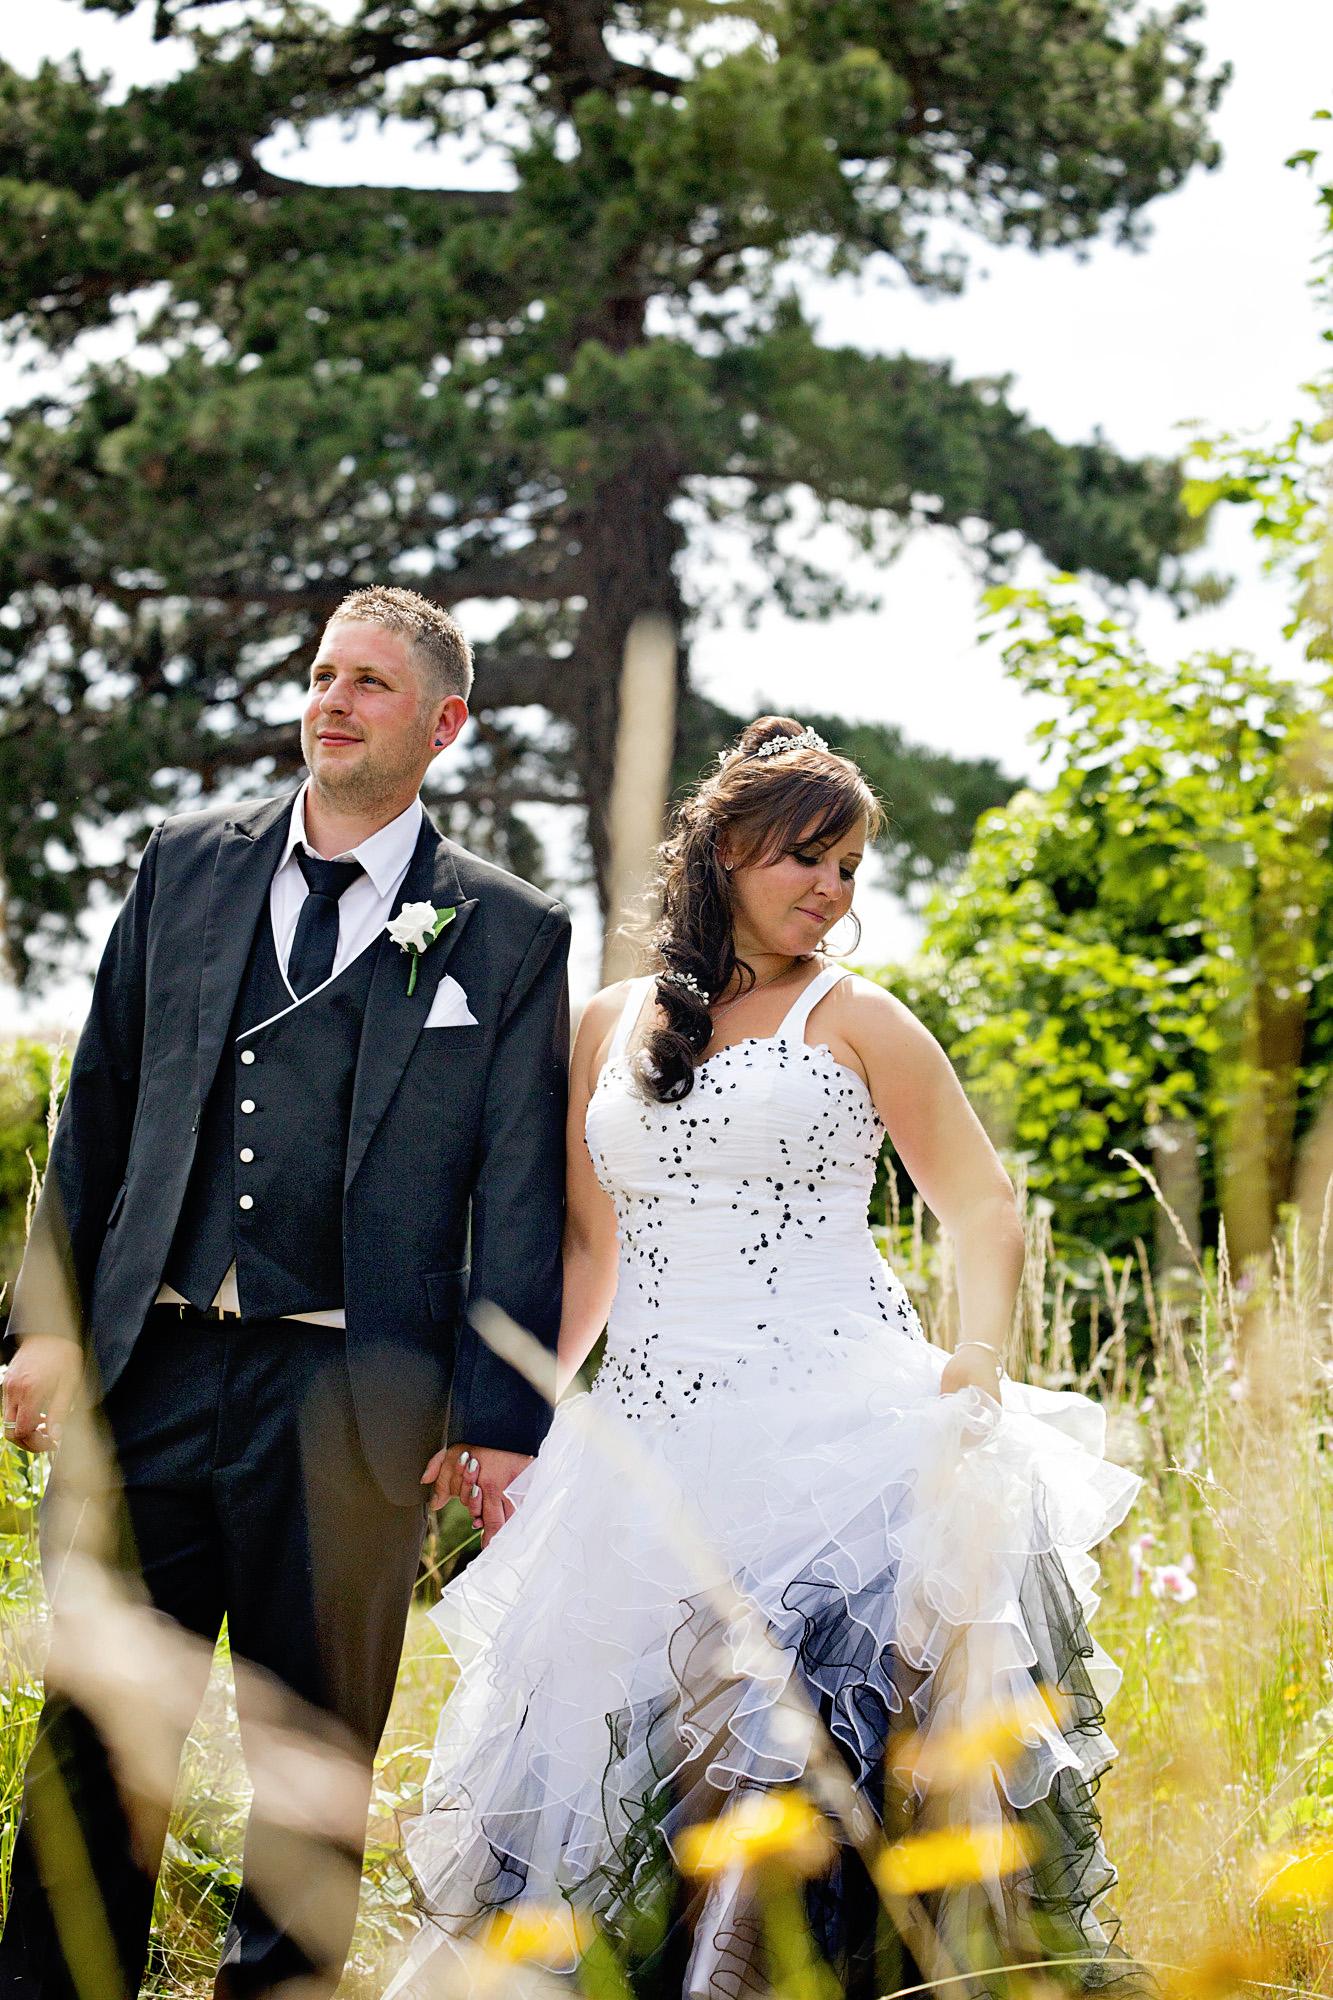 Crazy wedding at the haycock hotel (24).jpg